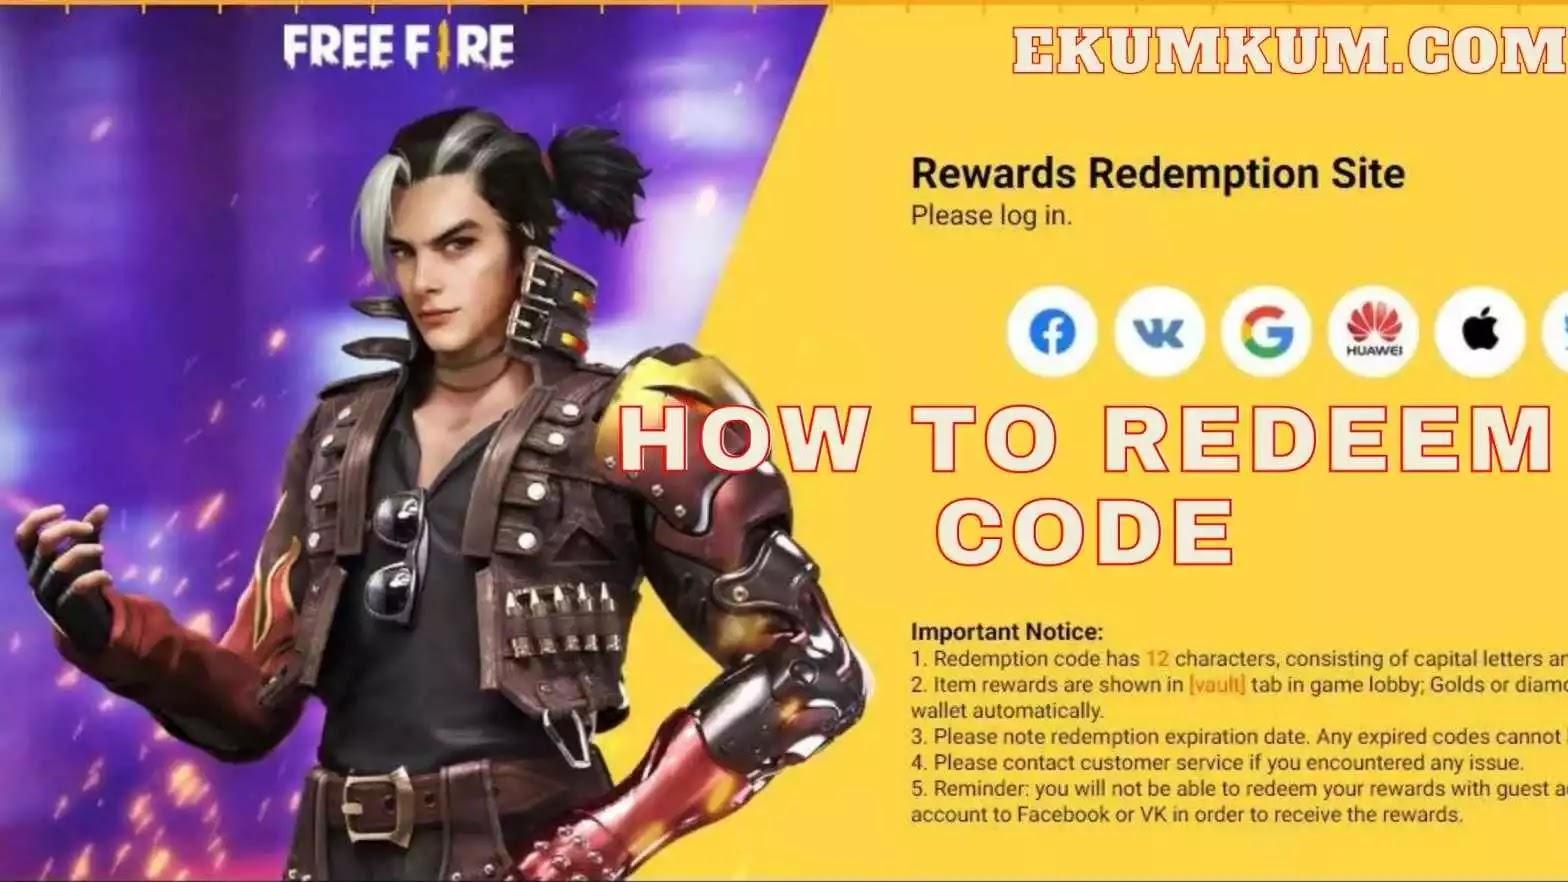 How To Redeem Code